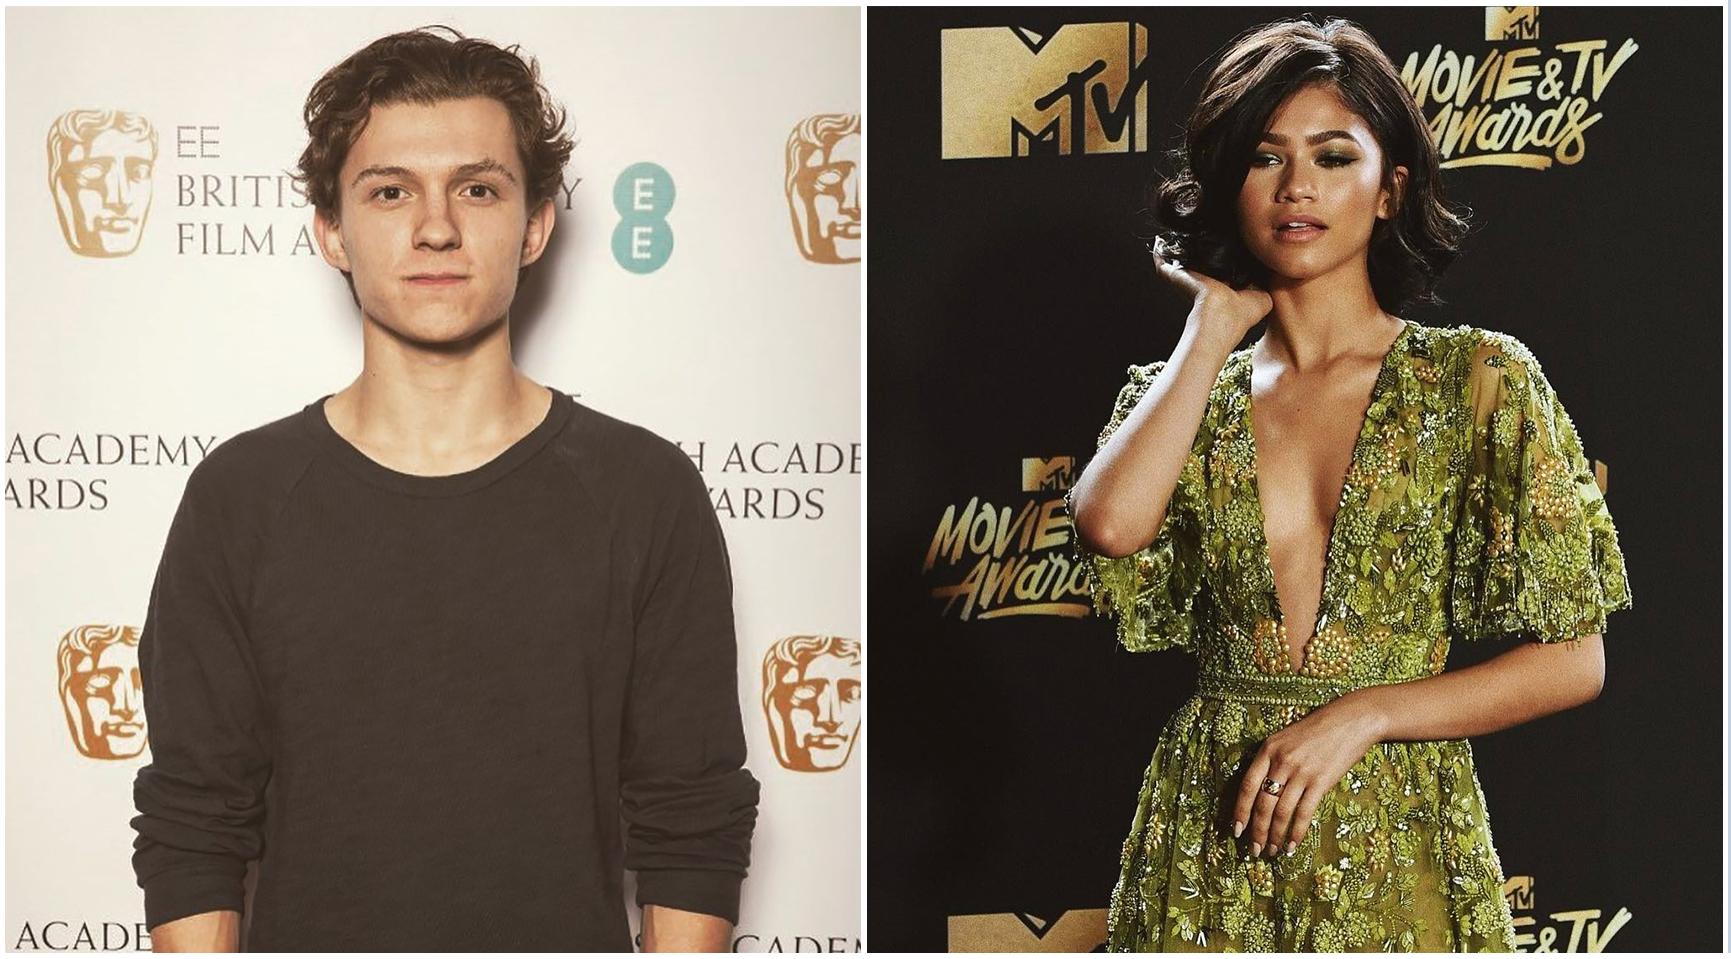 Tom Holland (left) , rumored girlfriend Zendaya (right)